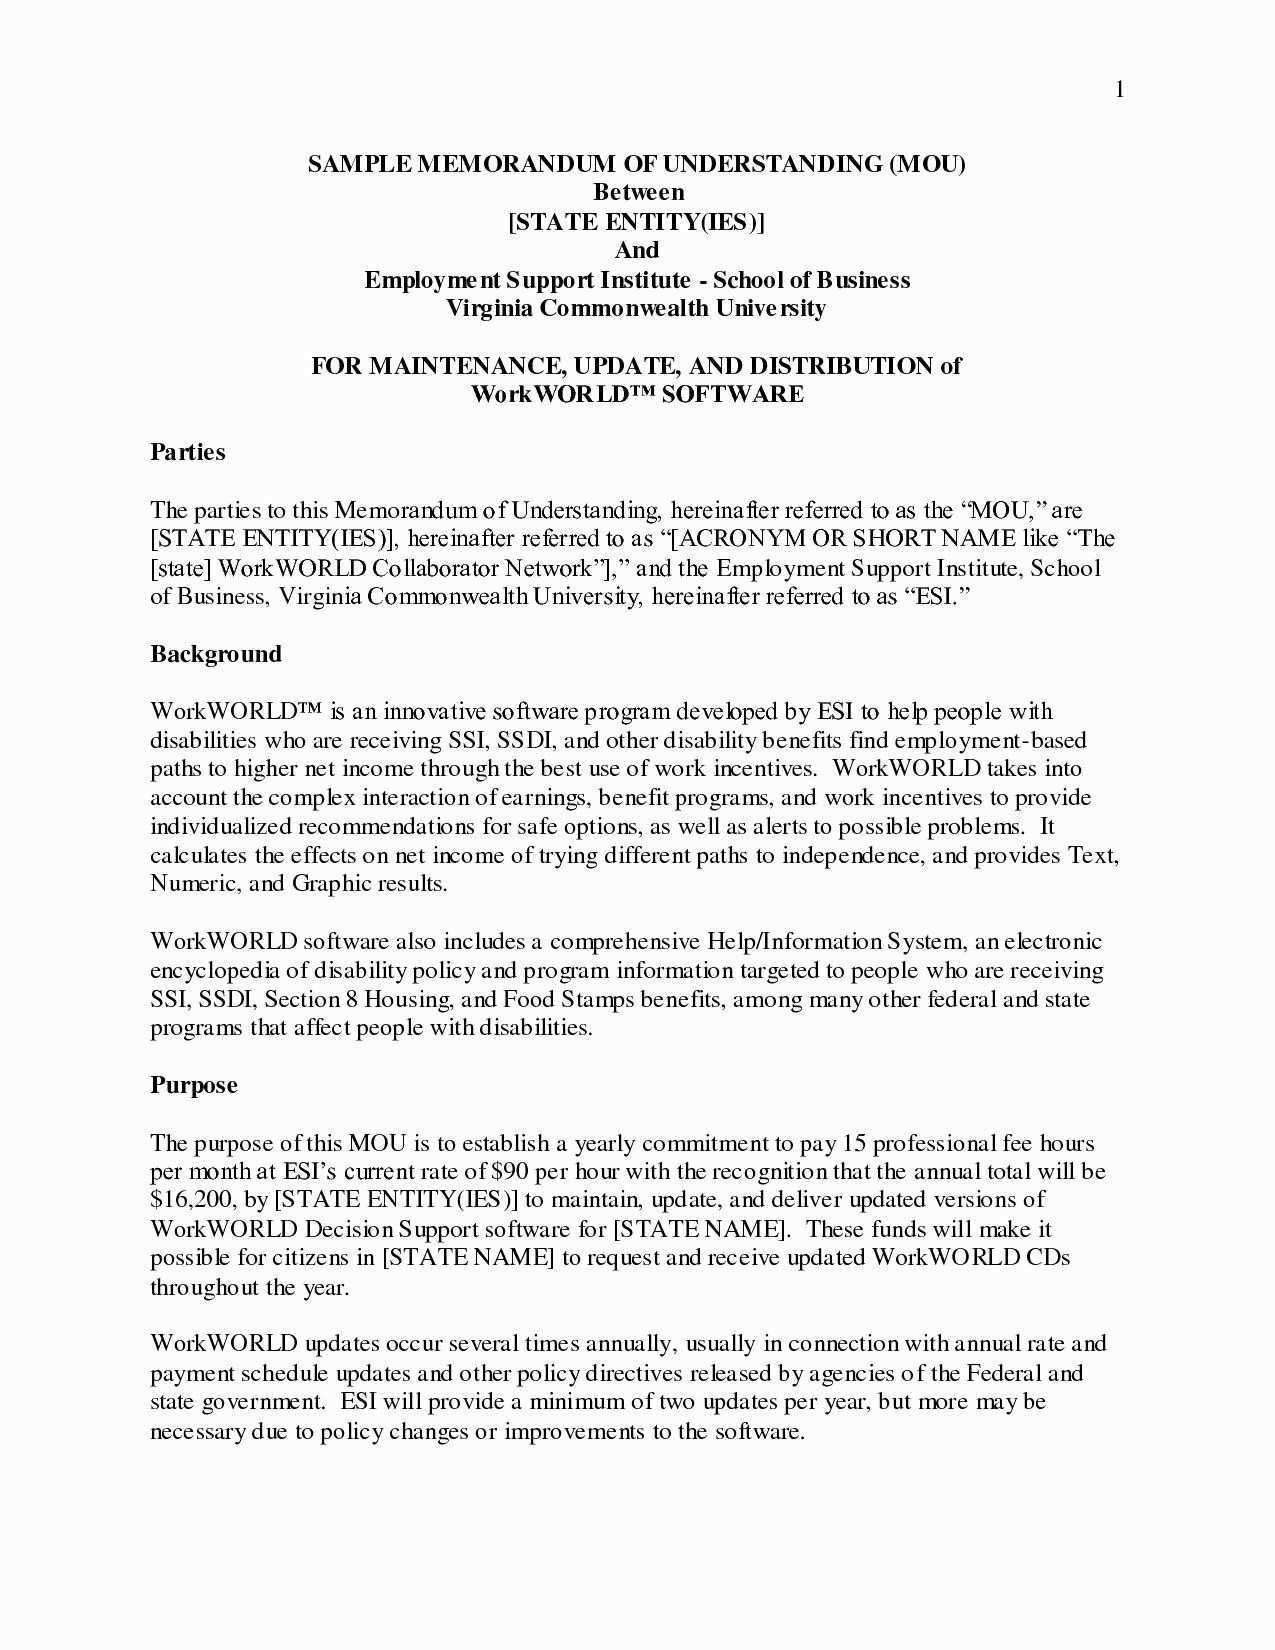 Memorandum Of Understanding Sample Luxury Valid Memorandum Understanding Template Australia Separation Agreement Template Separation Agreement Memorandum